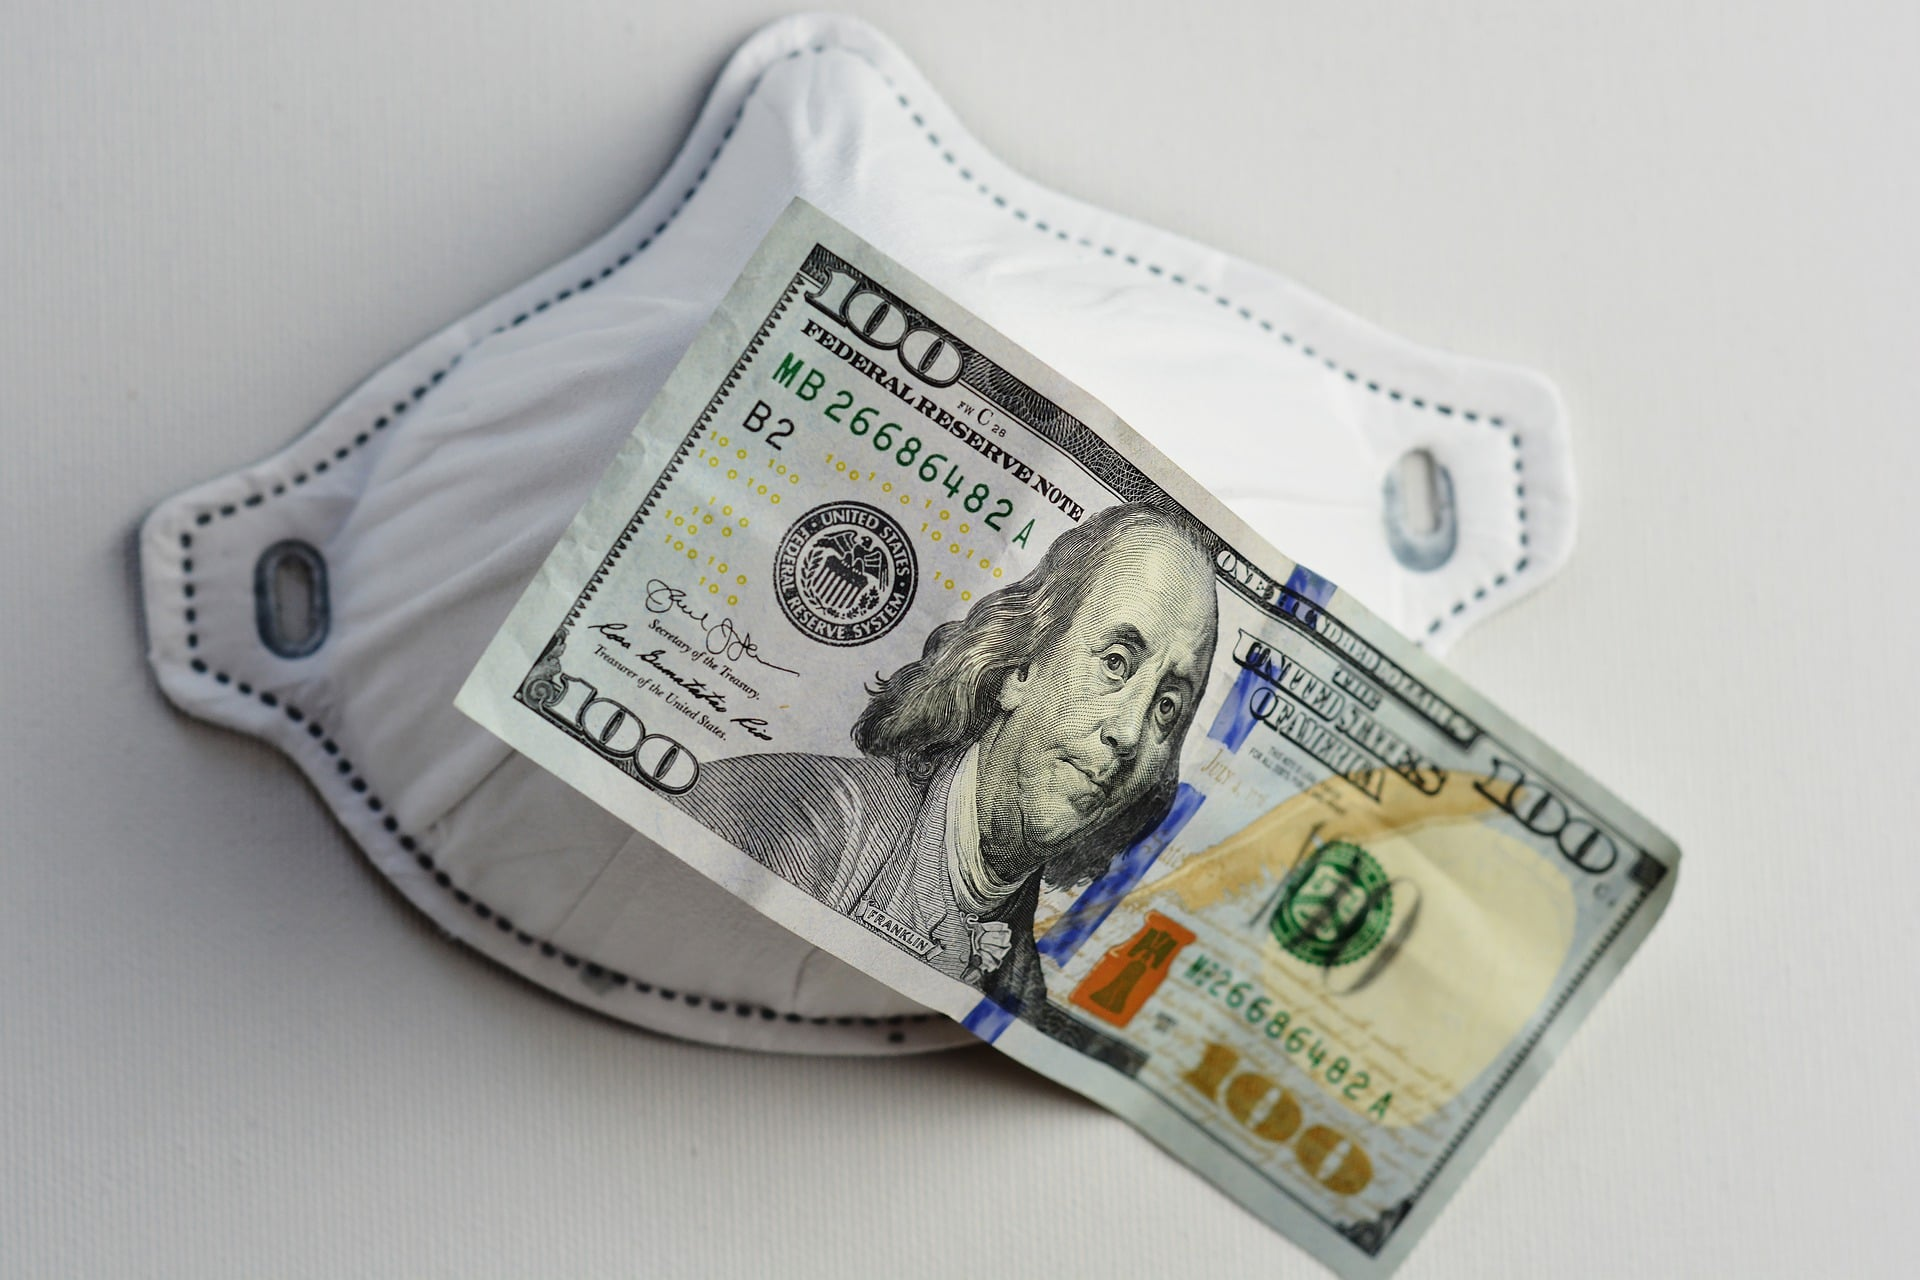 financially in times of Coronavirus